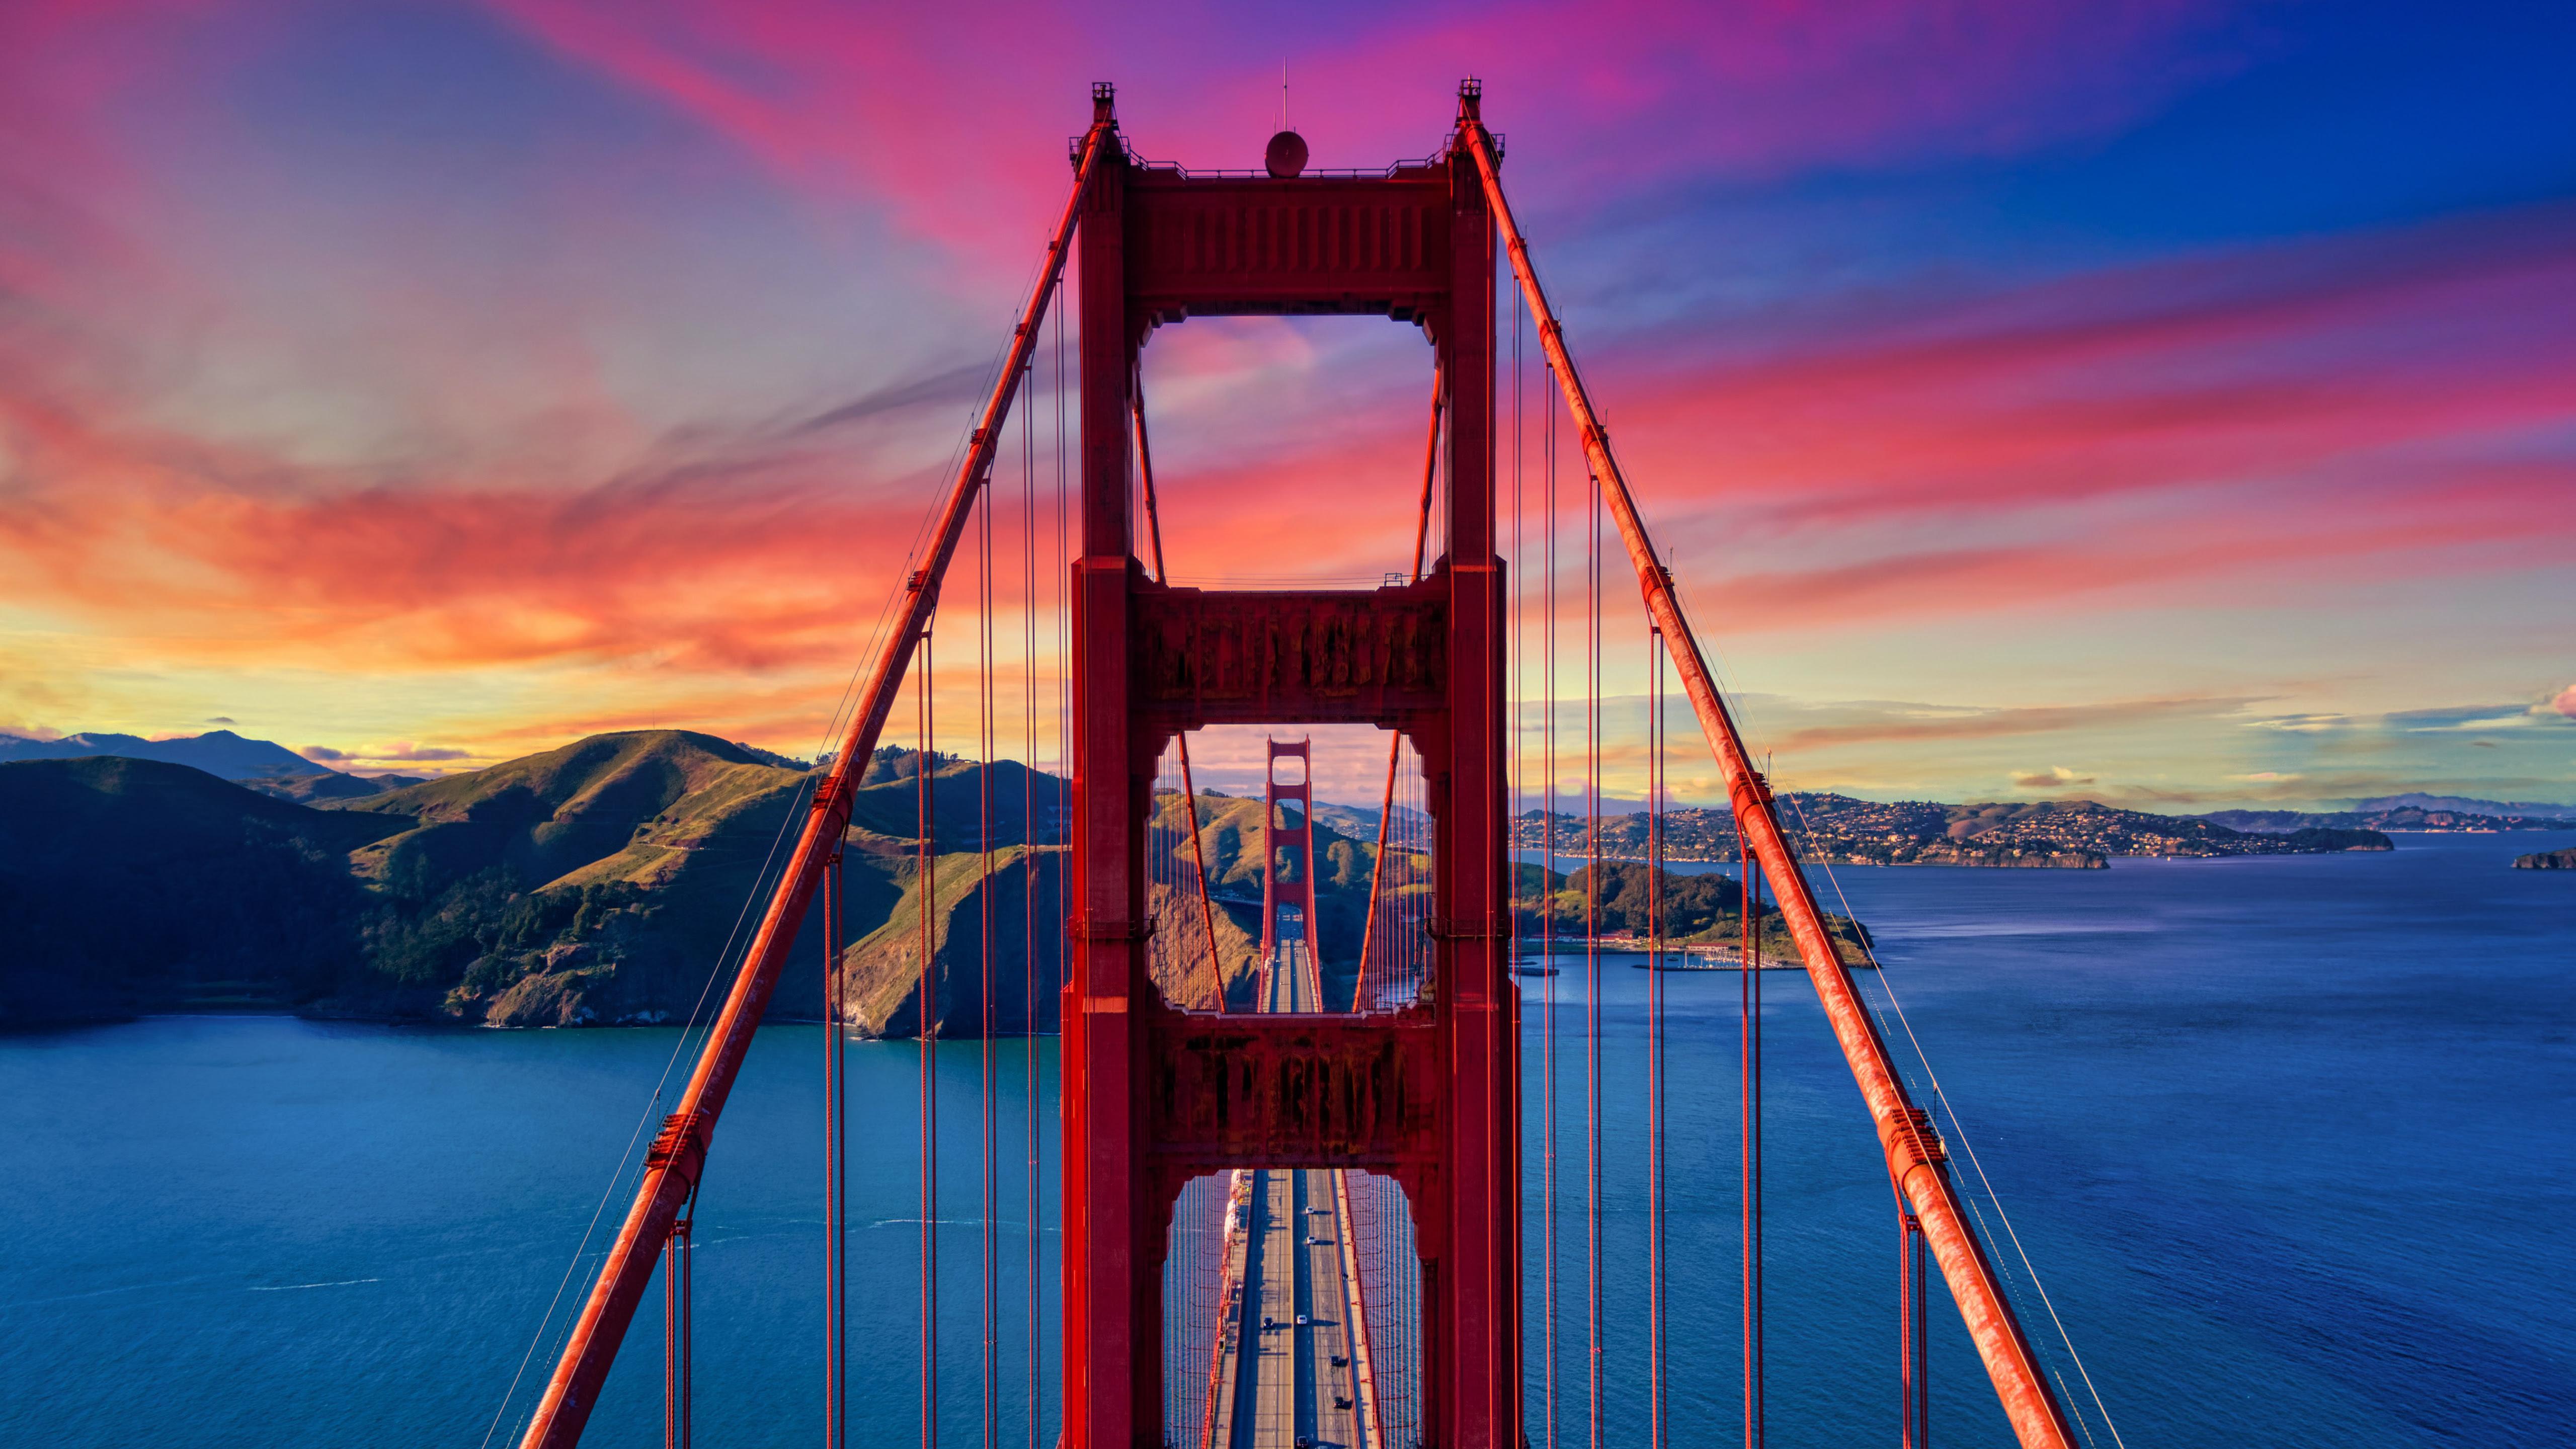 Golden Gate Bridge At Sunset 5k Wallpapers Hd Wallpapers